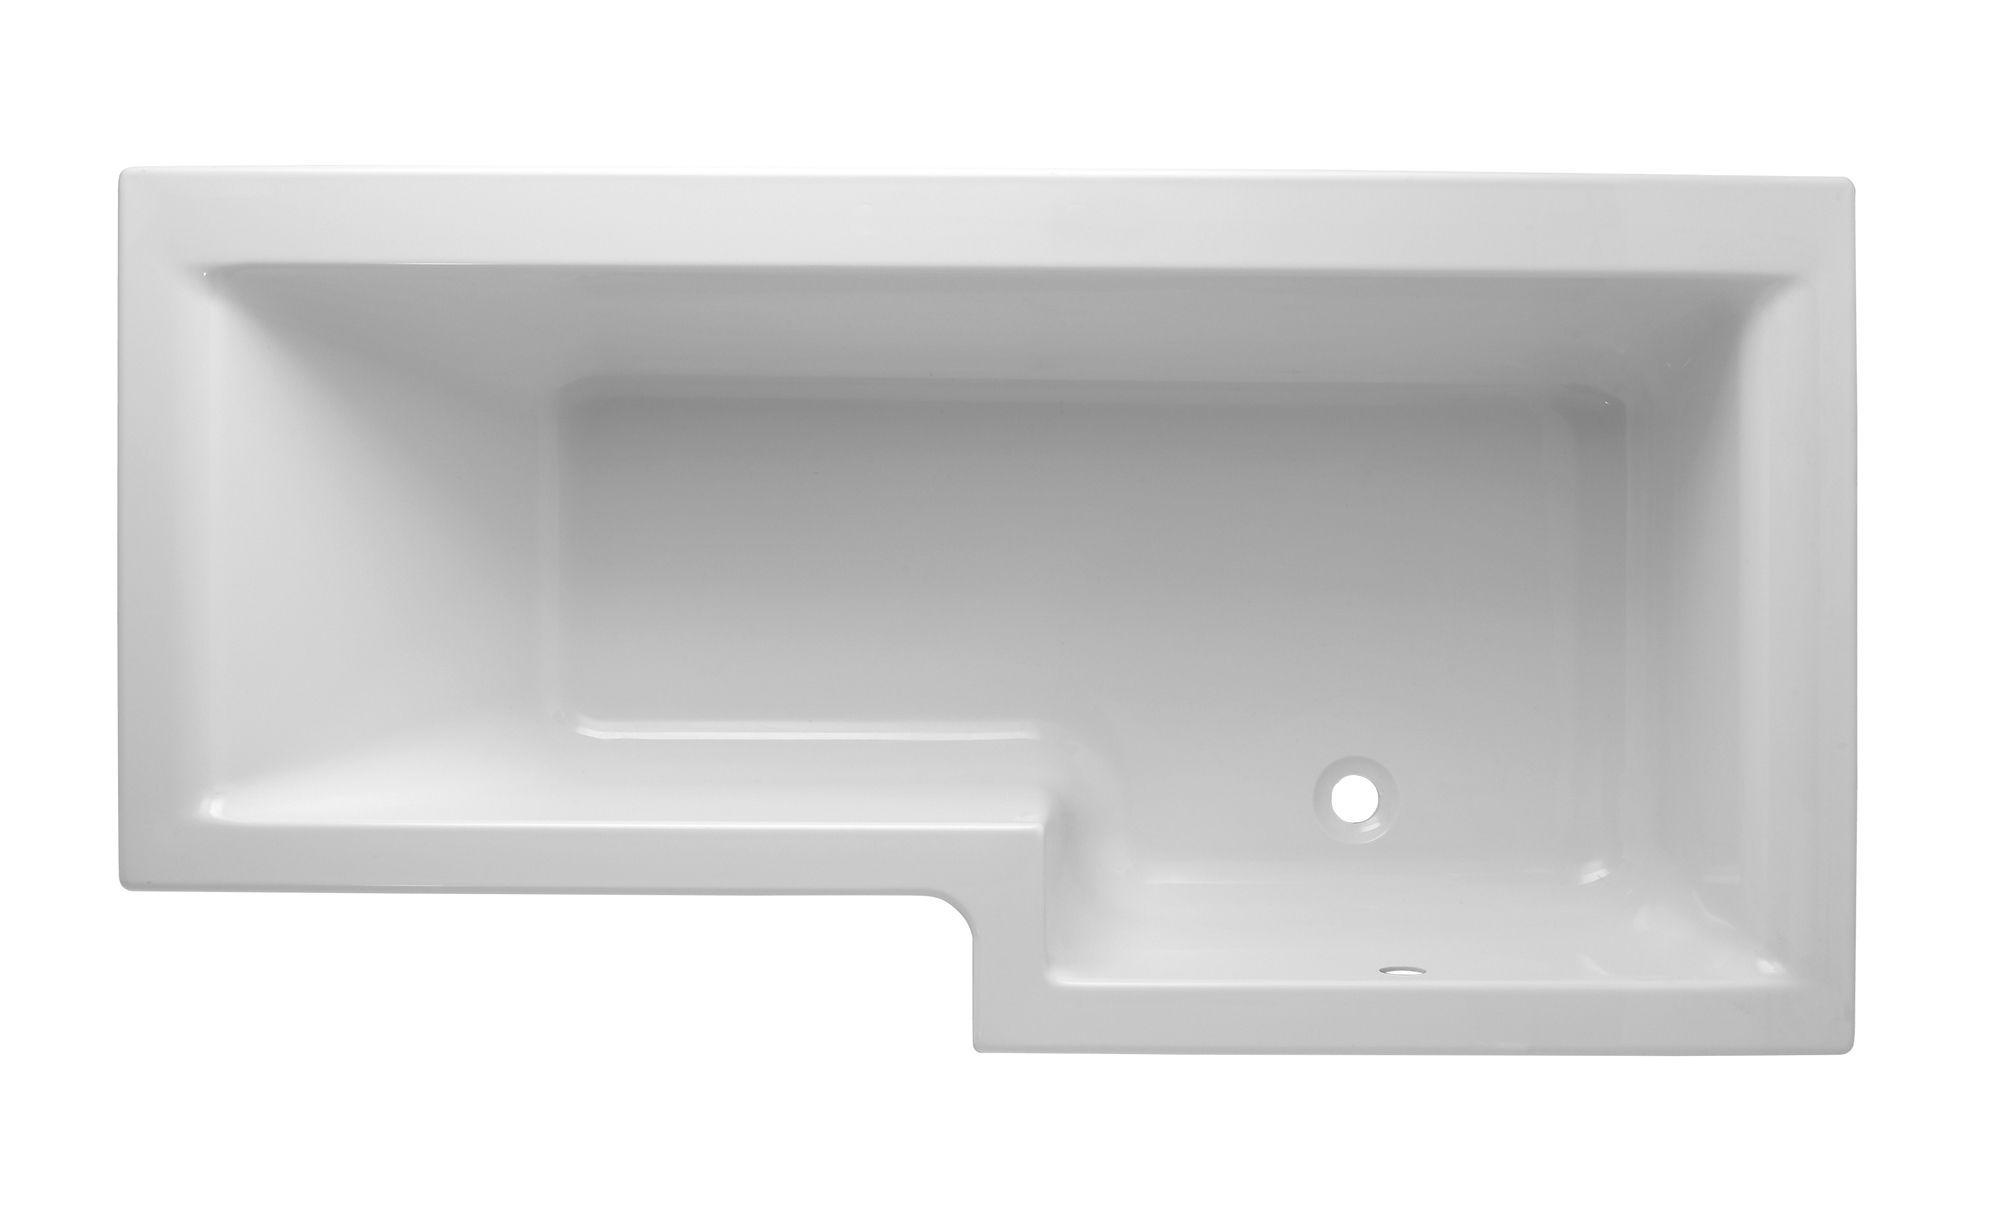 Cooke Lewis Adelphi Rh Acrylic L Shaped Shower Bath L 1675mm W 850mm Departments Diy At B Q